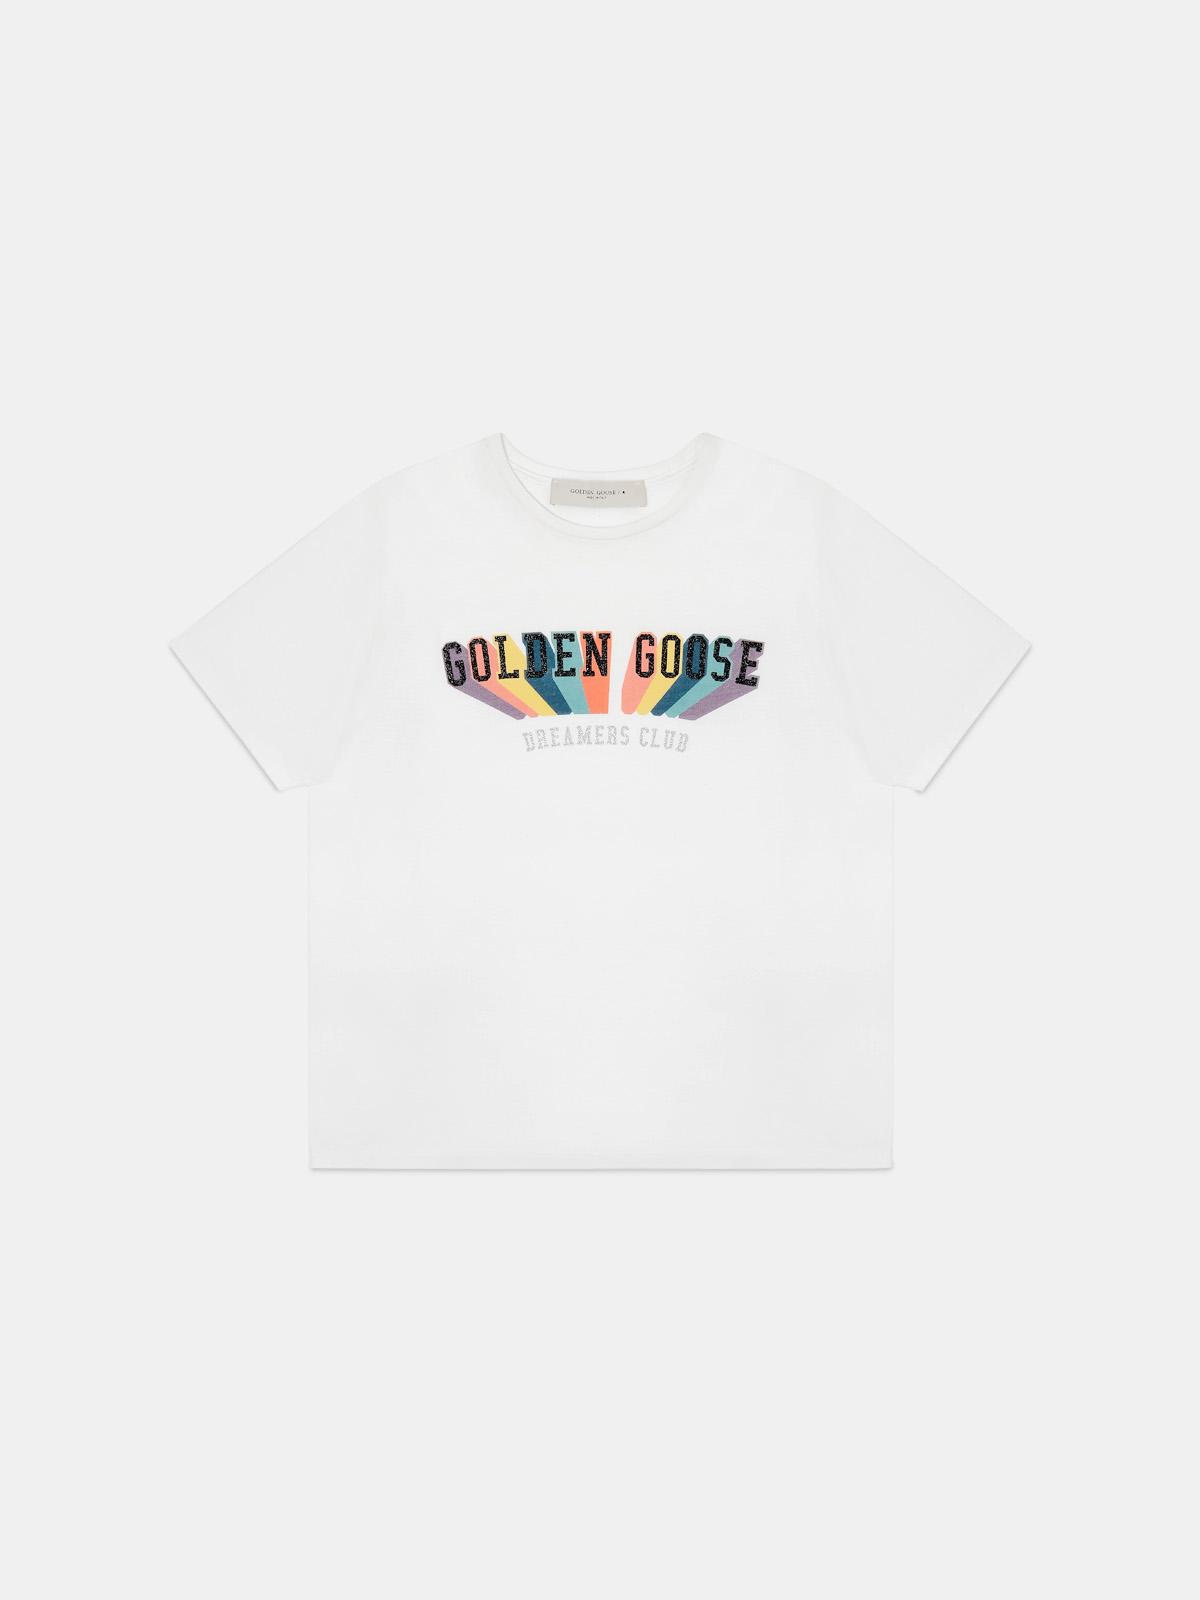 Golden Goose - T-shirt with rainbow Golden print in